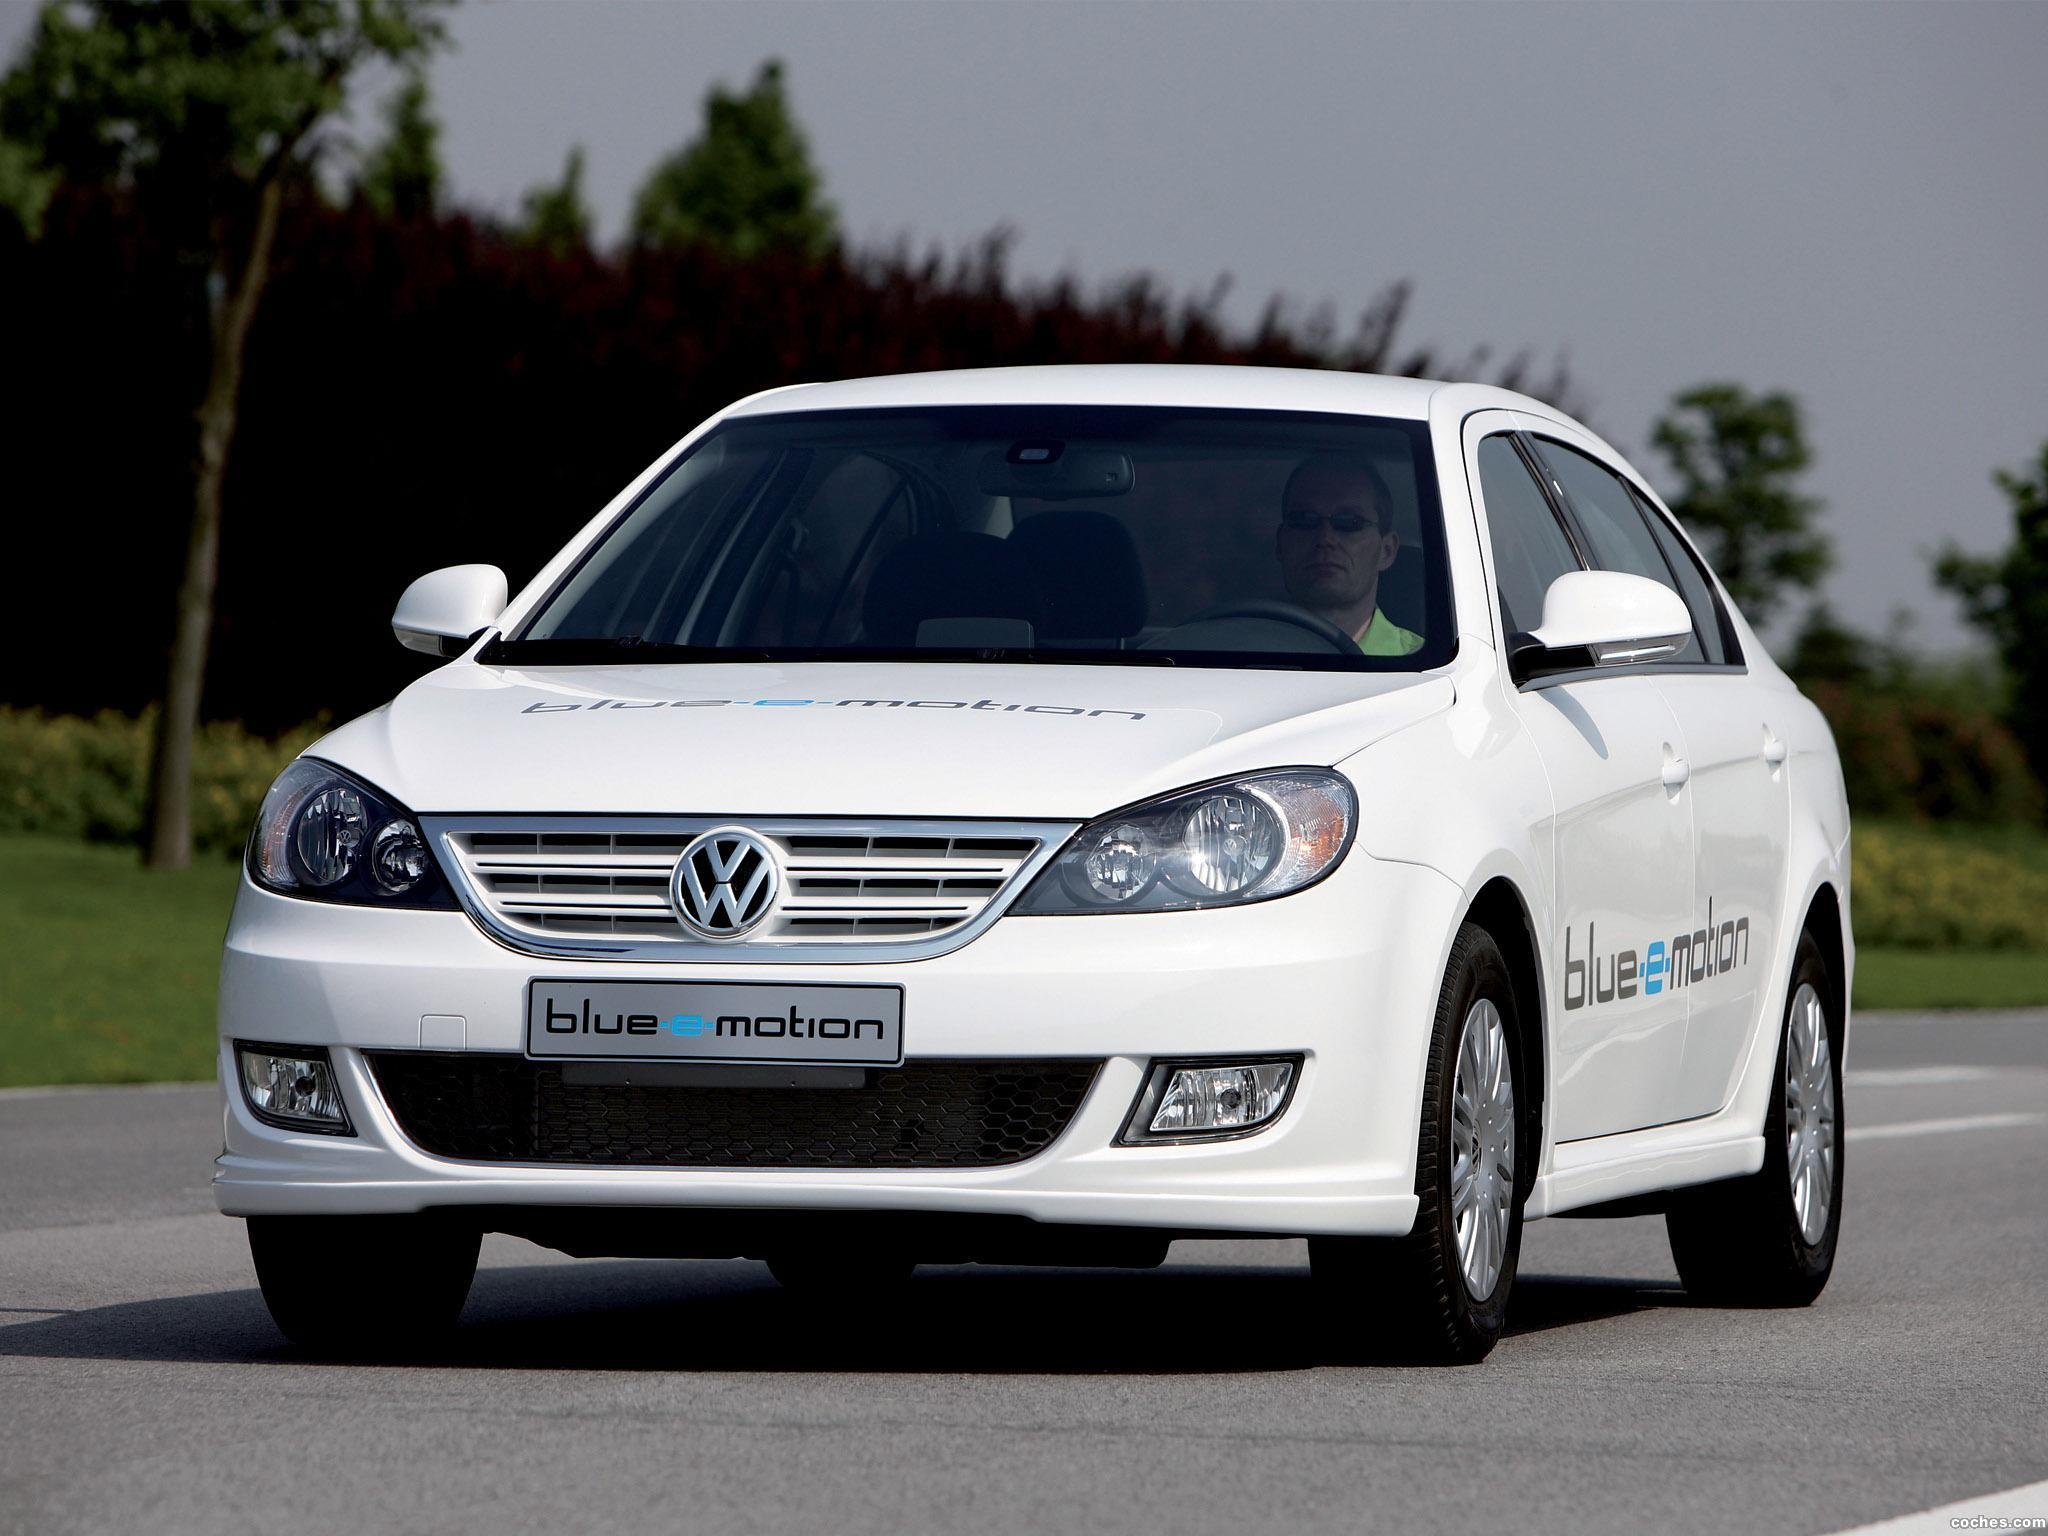 Foto 0 de Volkswagen Lavida Blue e-Motion 2010